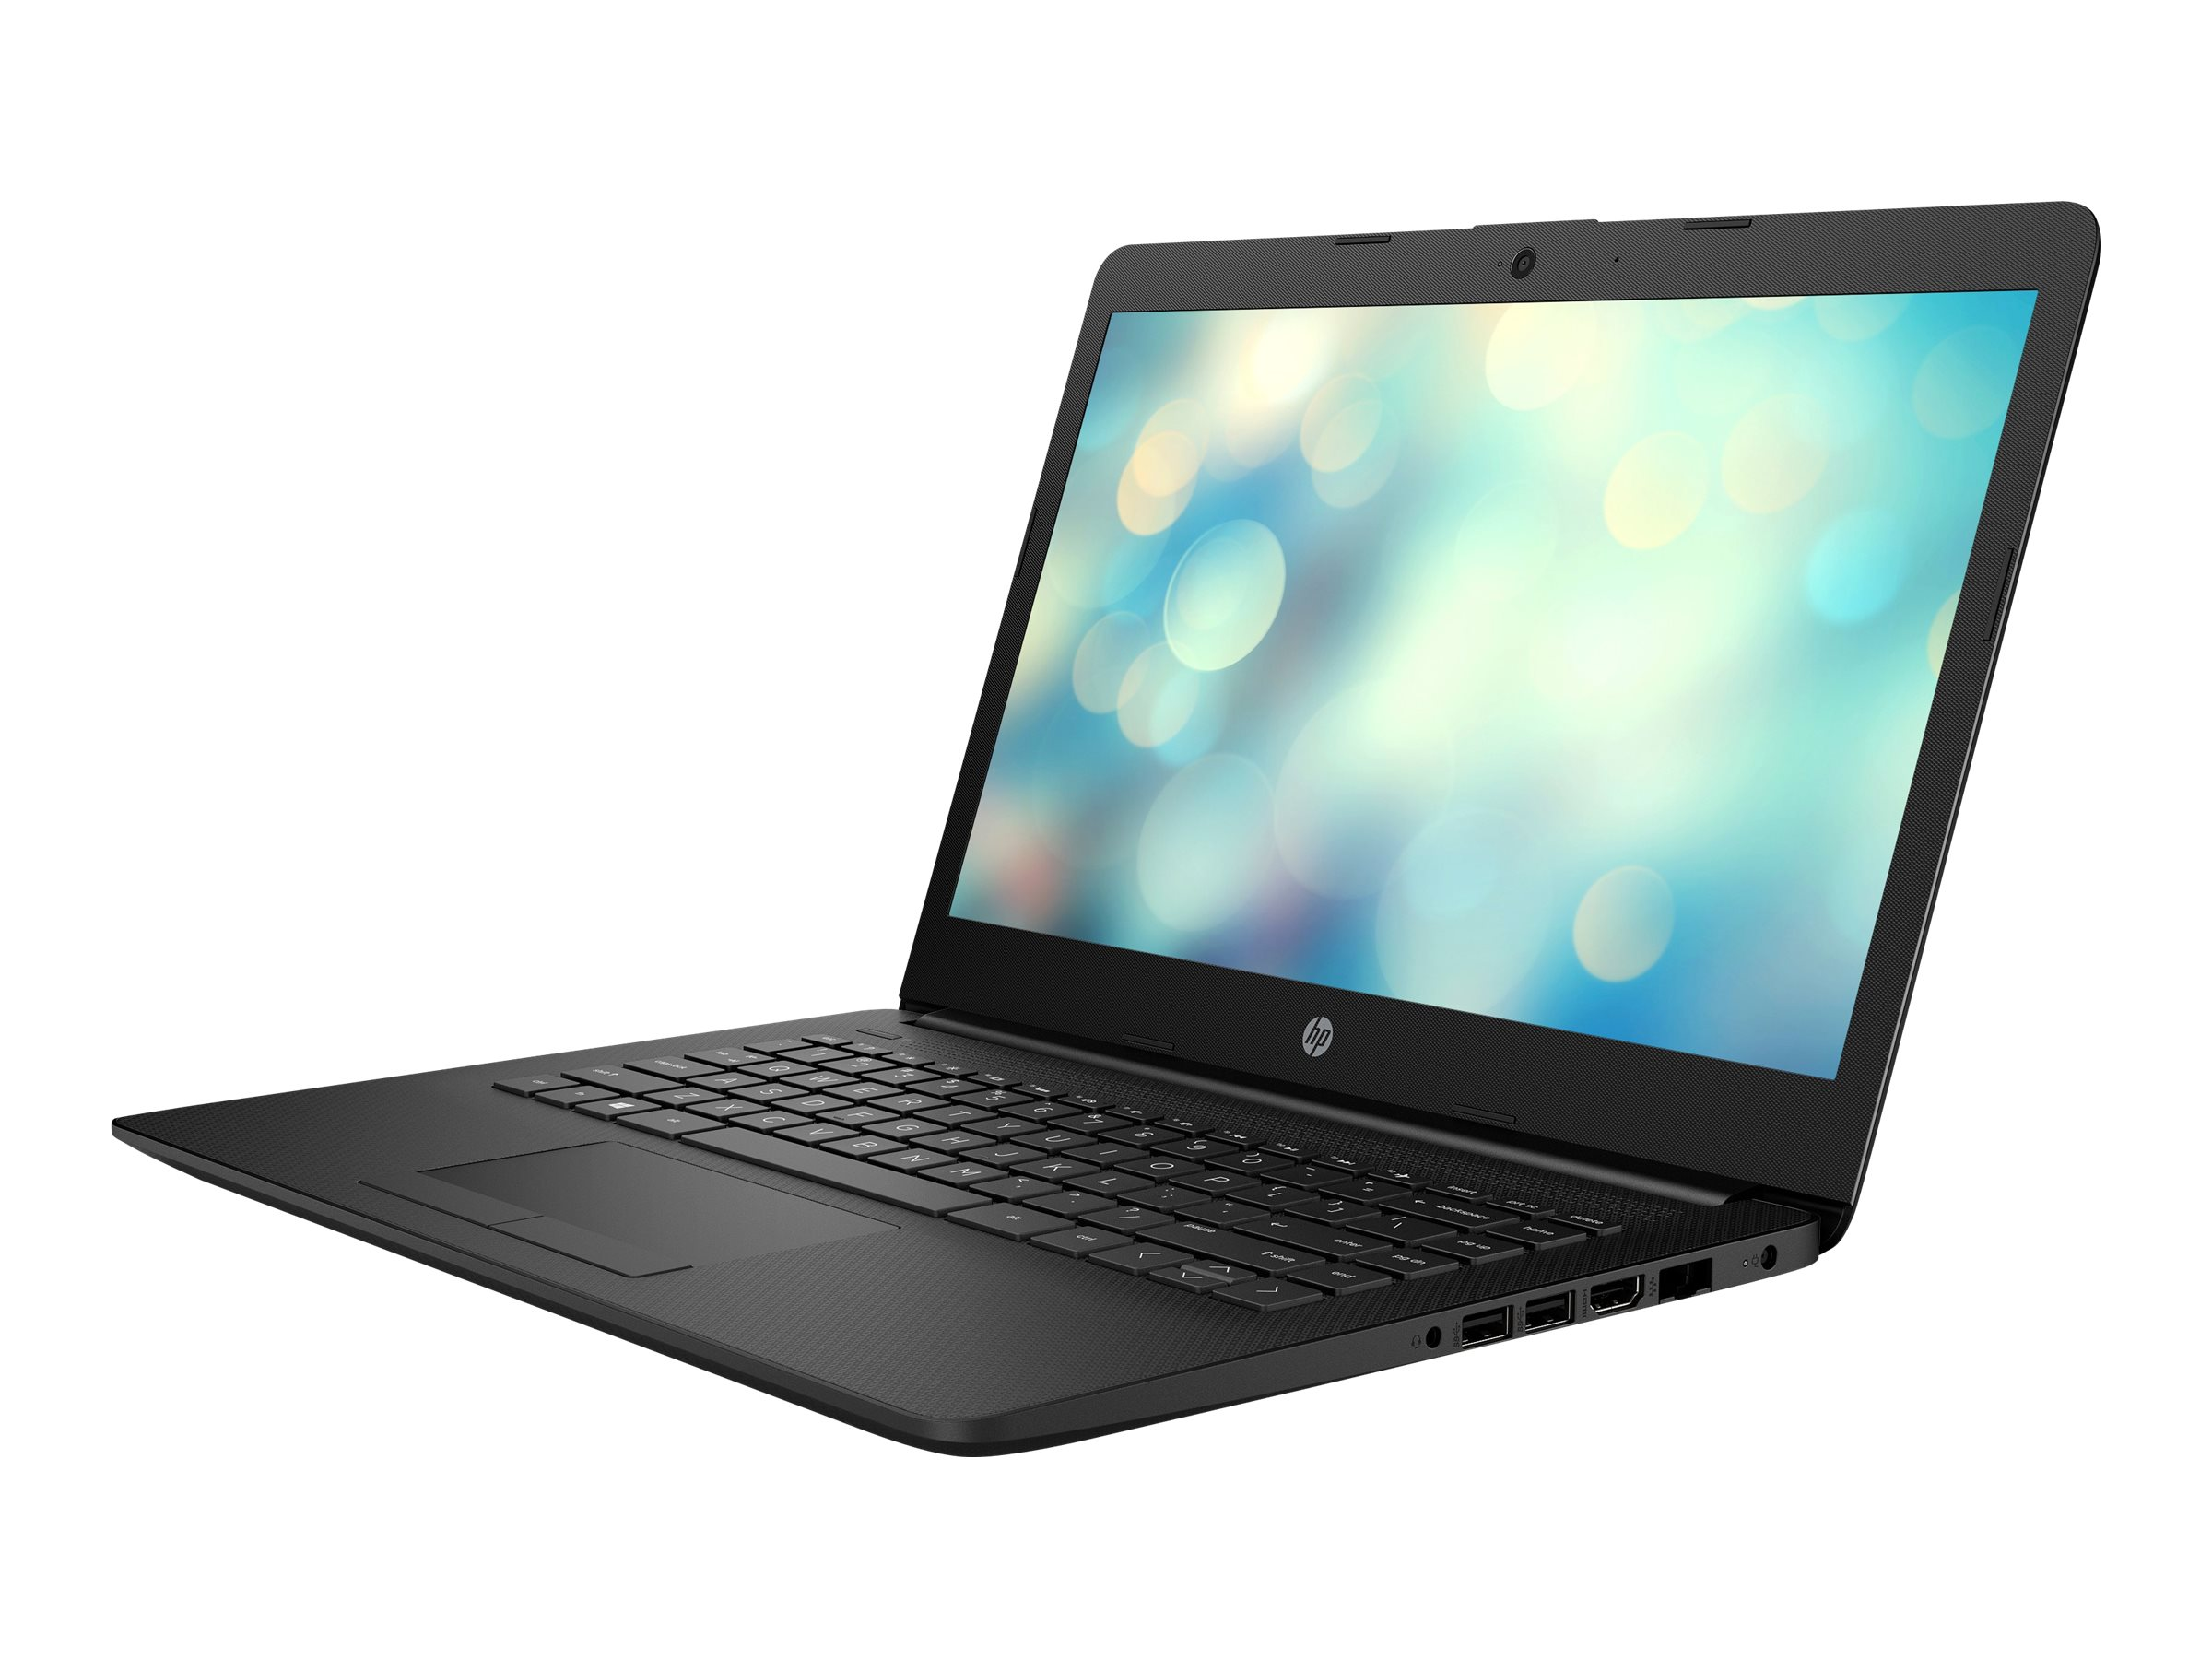 "HP 14-ck0105ng - Pentium Gold 4417U / 2.3 GHz - FreeDOS 2.0 - 8 GB RAM - 256 GB SSD - 35.6 cm (14"")"